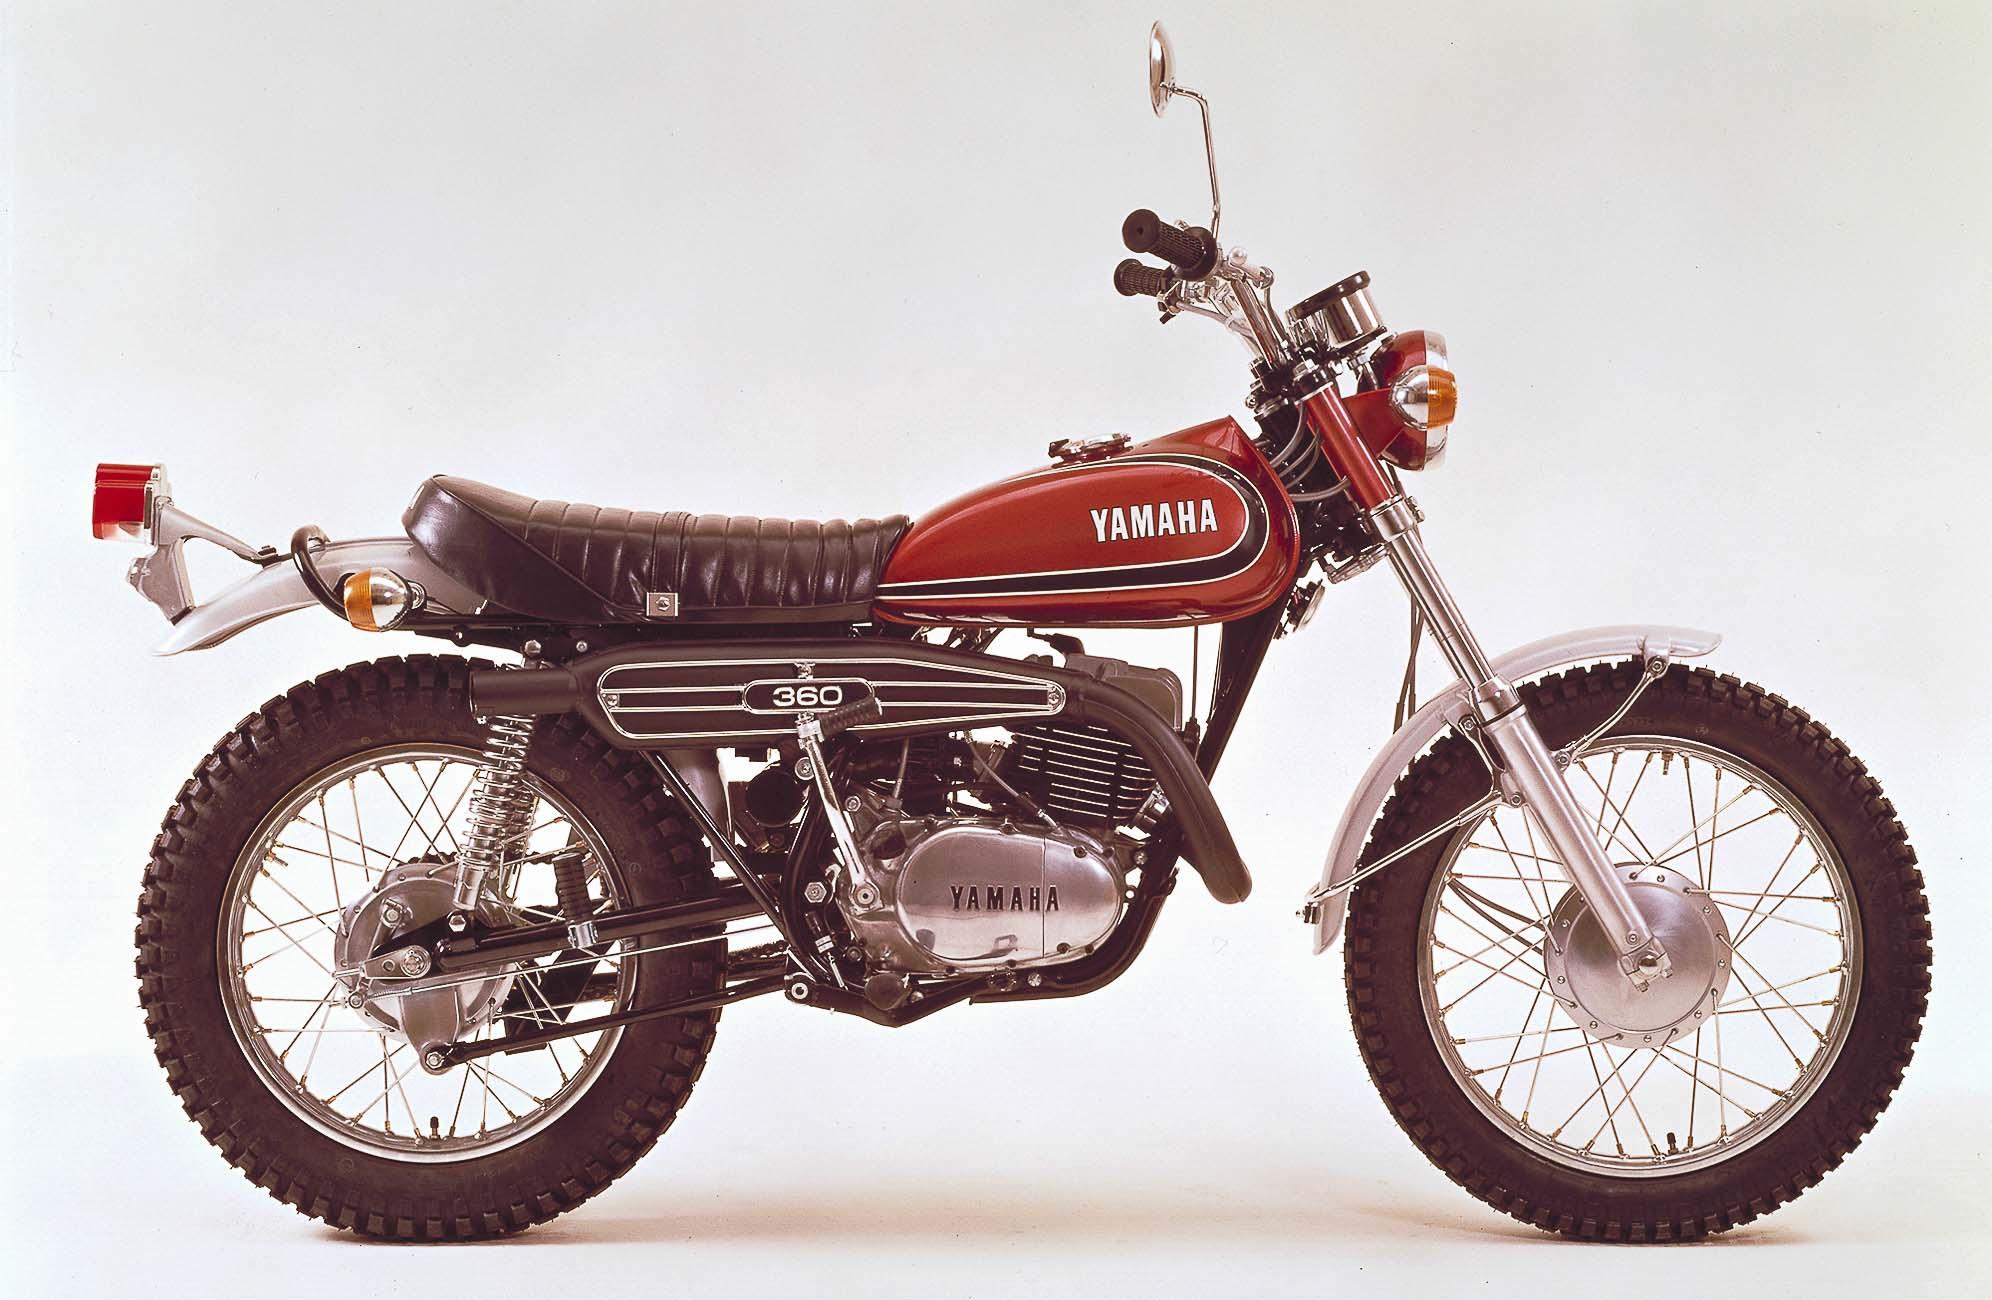 YAMAHA RT 360 (1970 - 1974)